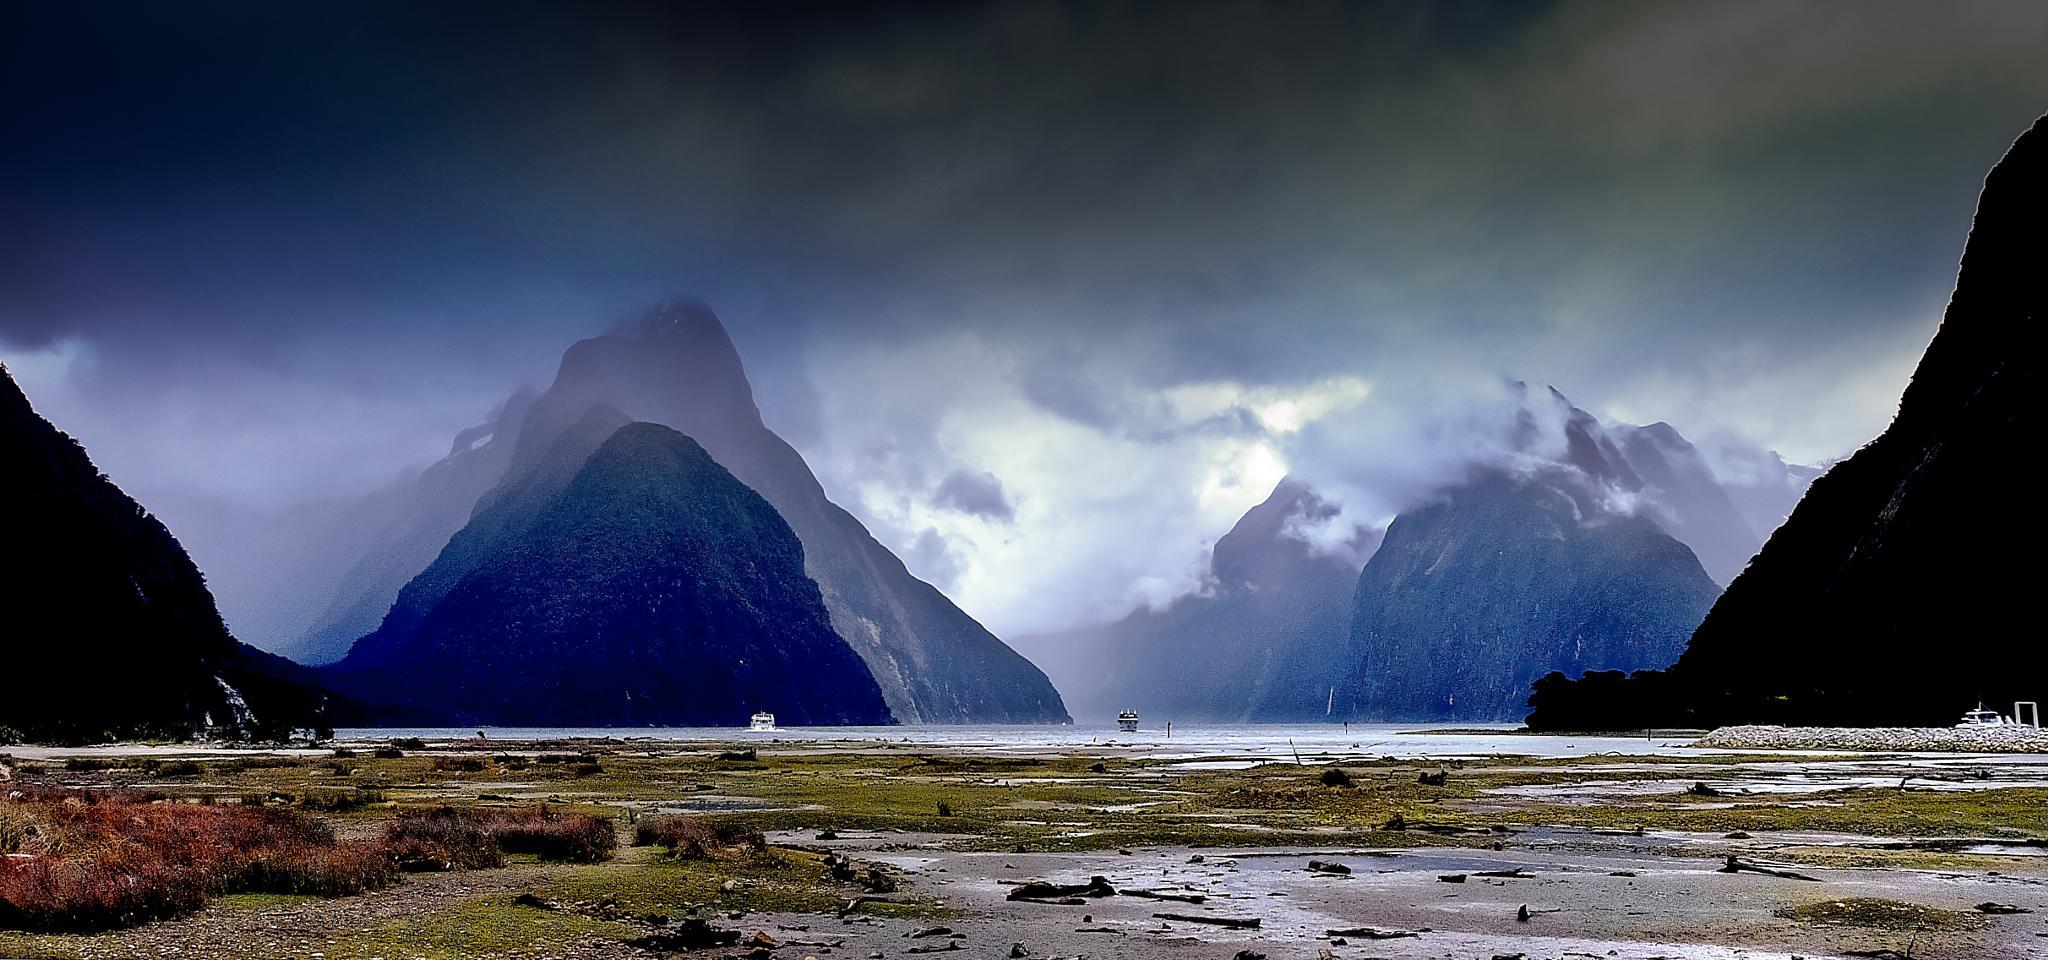 Milford Sound NZ by Peter Edwardo Vicente.